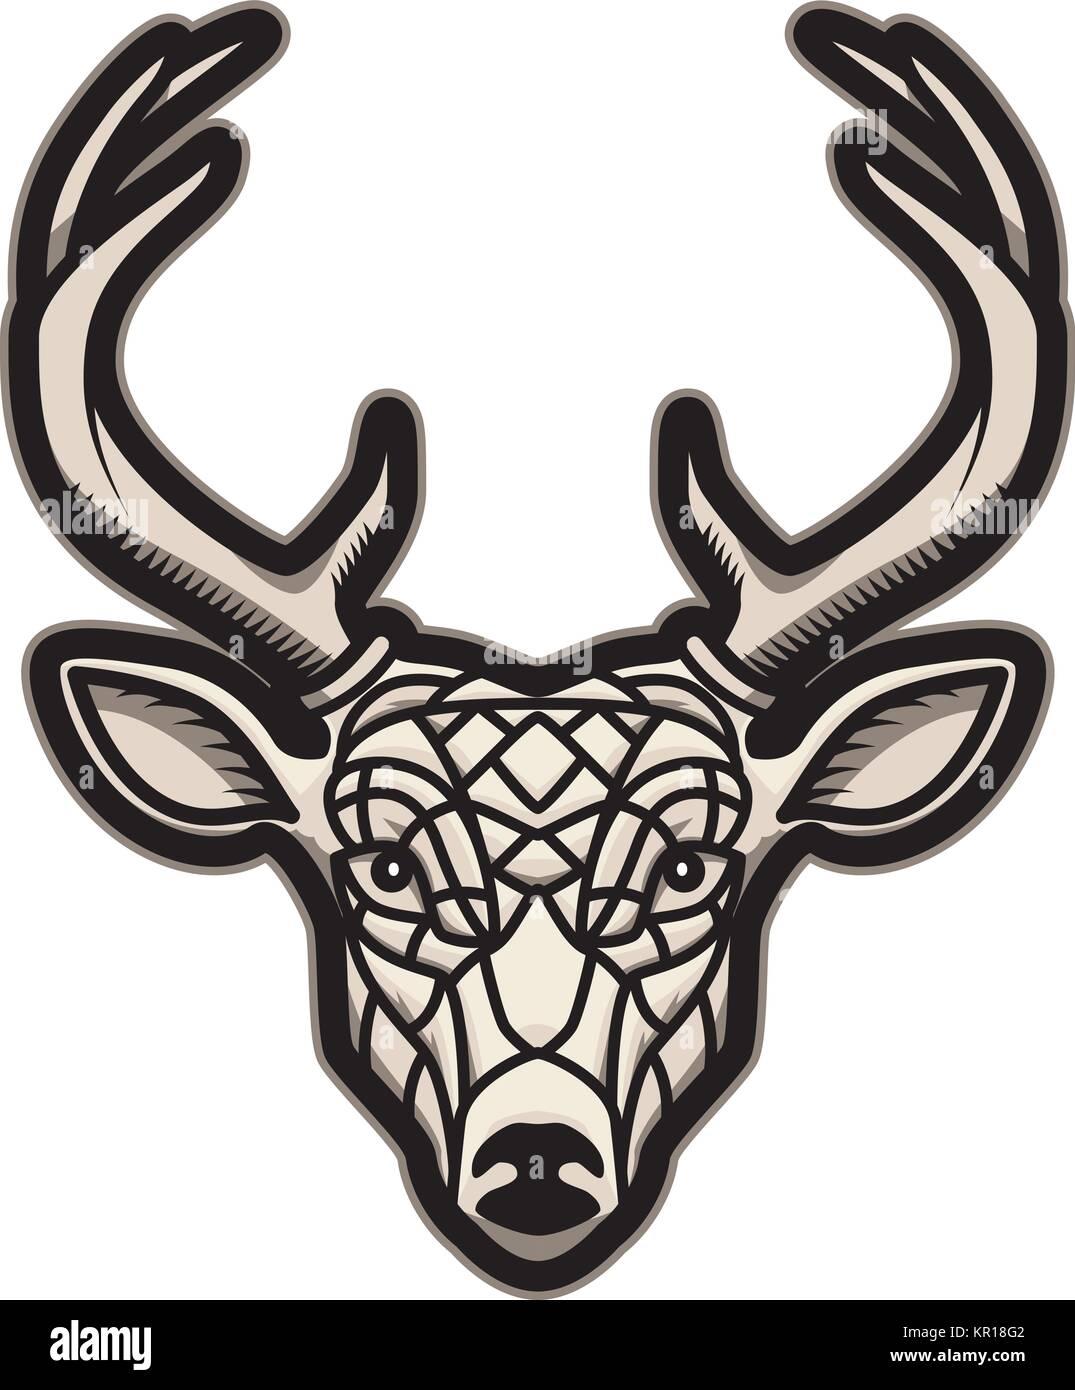 Deer Head Icon Isolated On White Background Design Element For Logo Label Emblem Sign Poster Vector Illustration